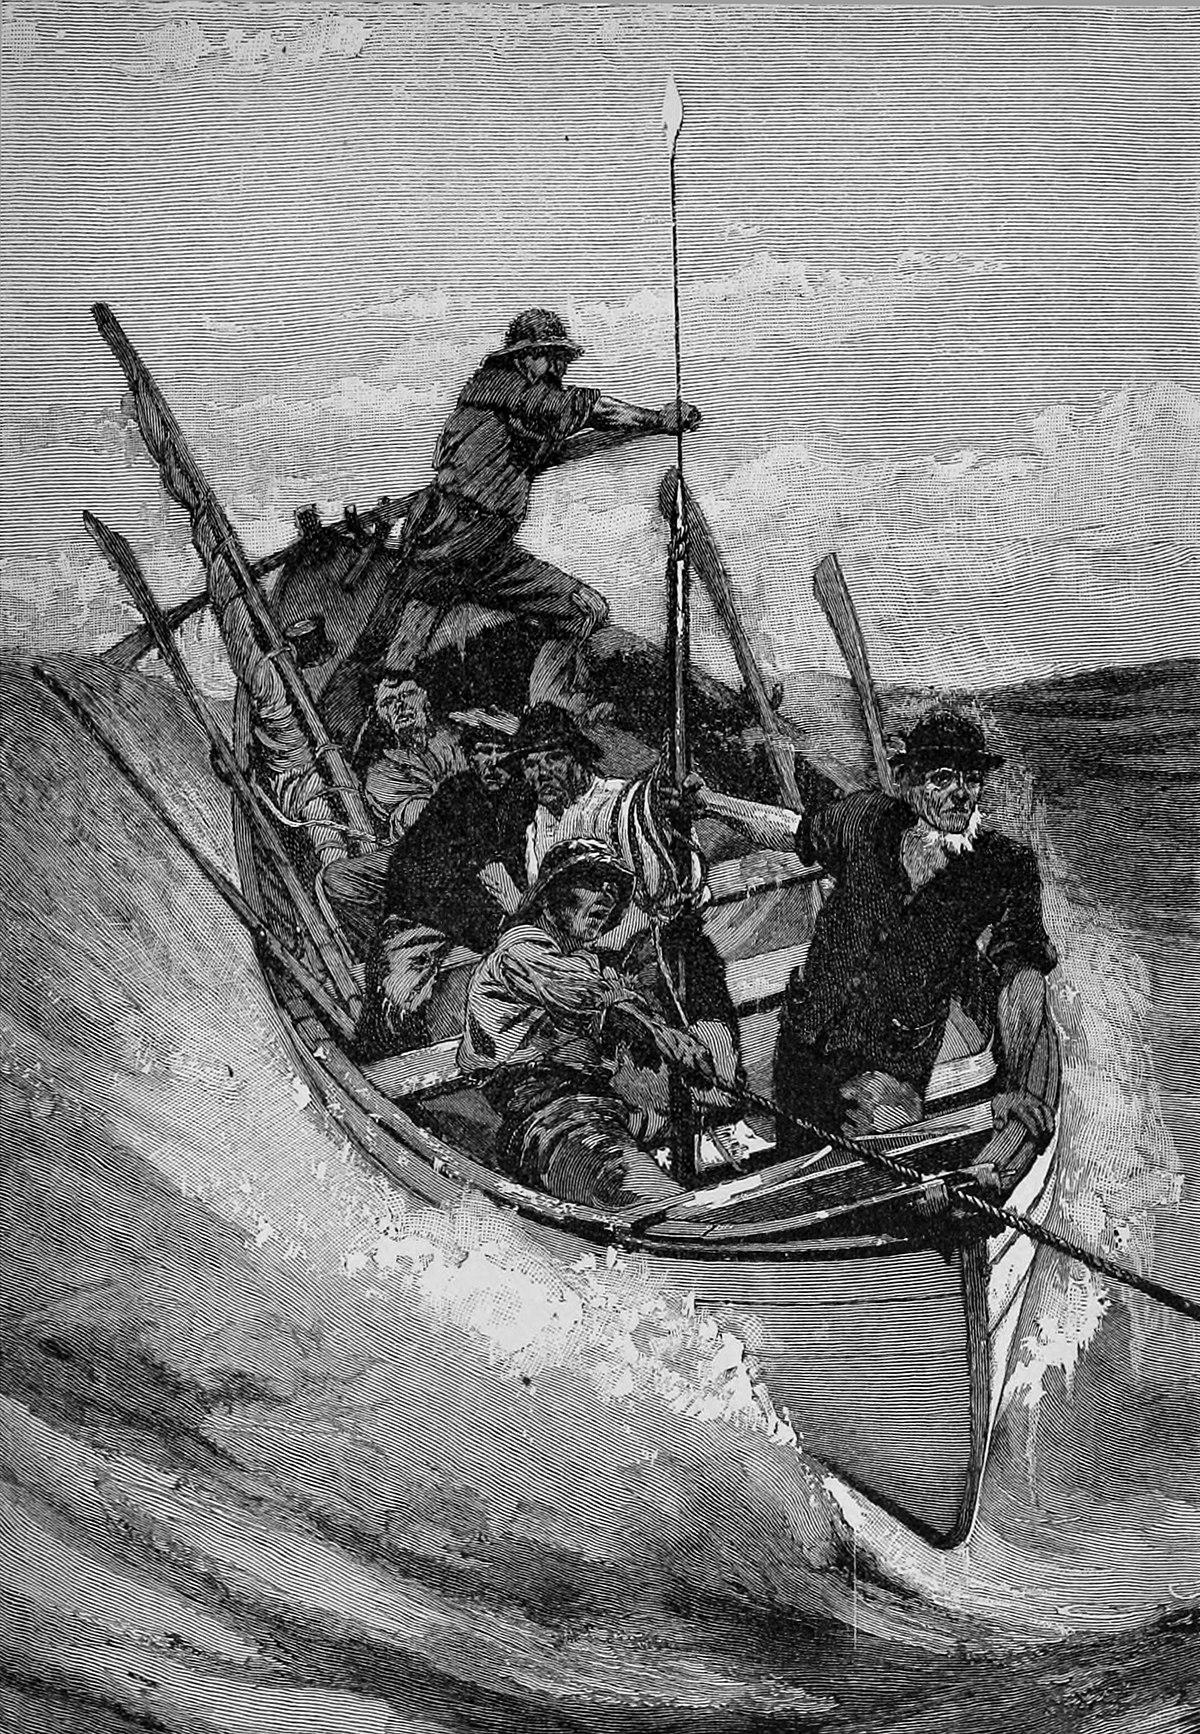 The Good Ride >> Nantucket sleigh ride - Wiktionary